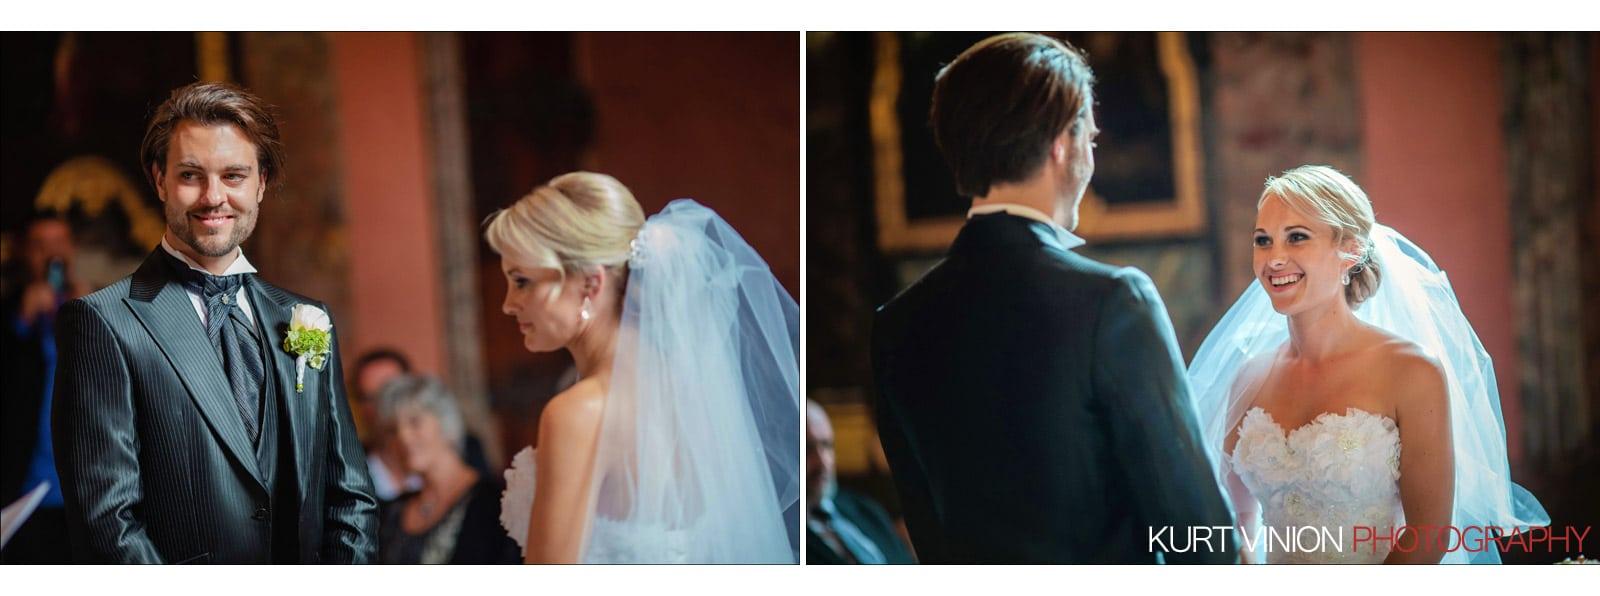 Prague Clementinum wedding / Jess + James - wedding pictures